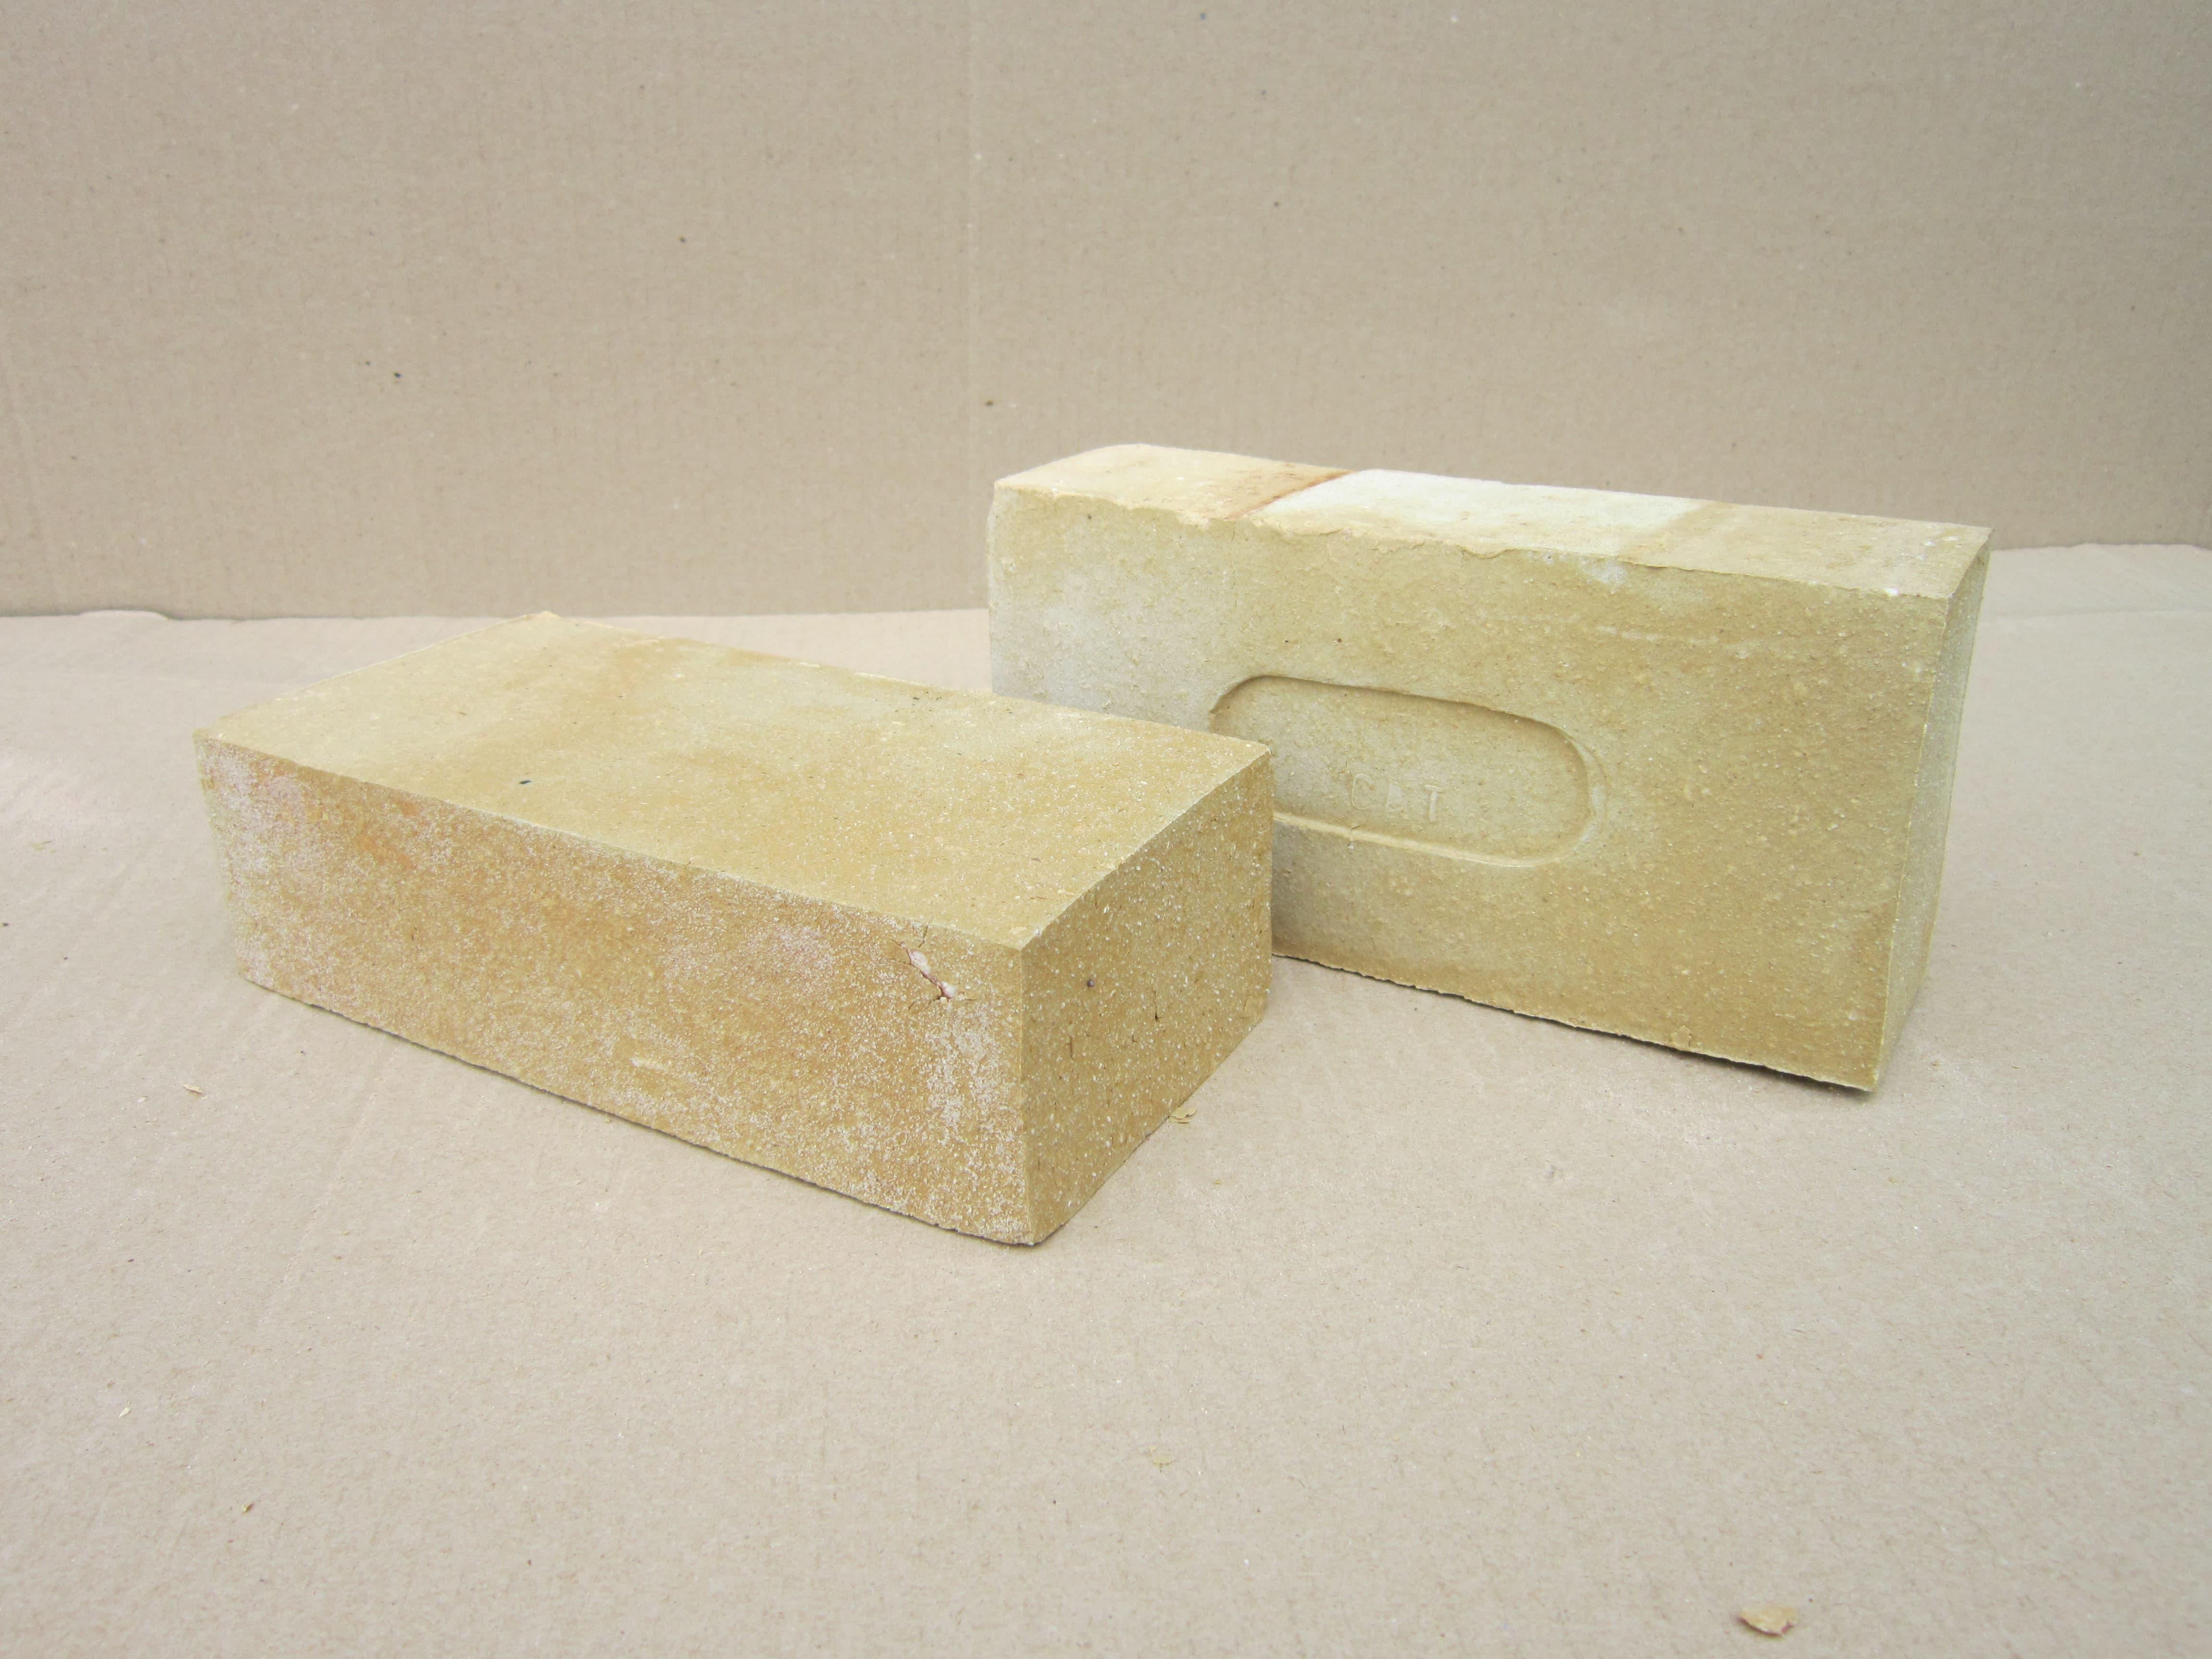 Плитка кислотоупорная ГОСТ 961-89 (ПП-5)